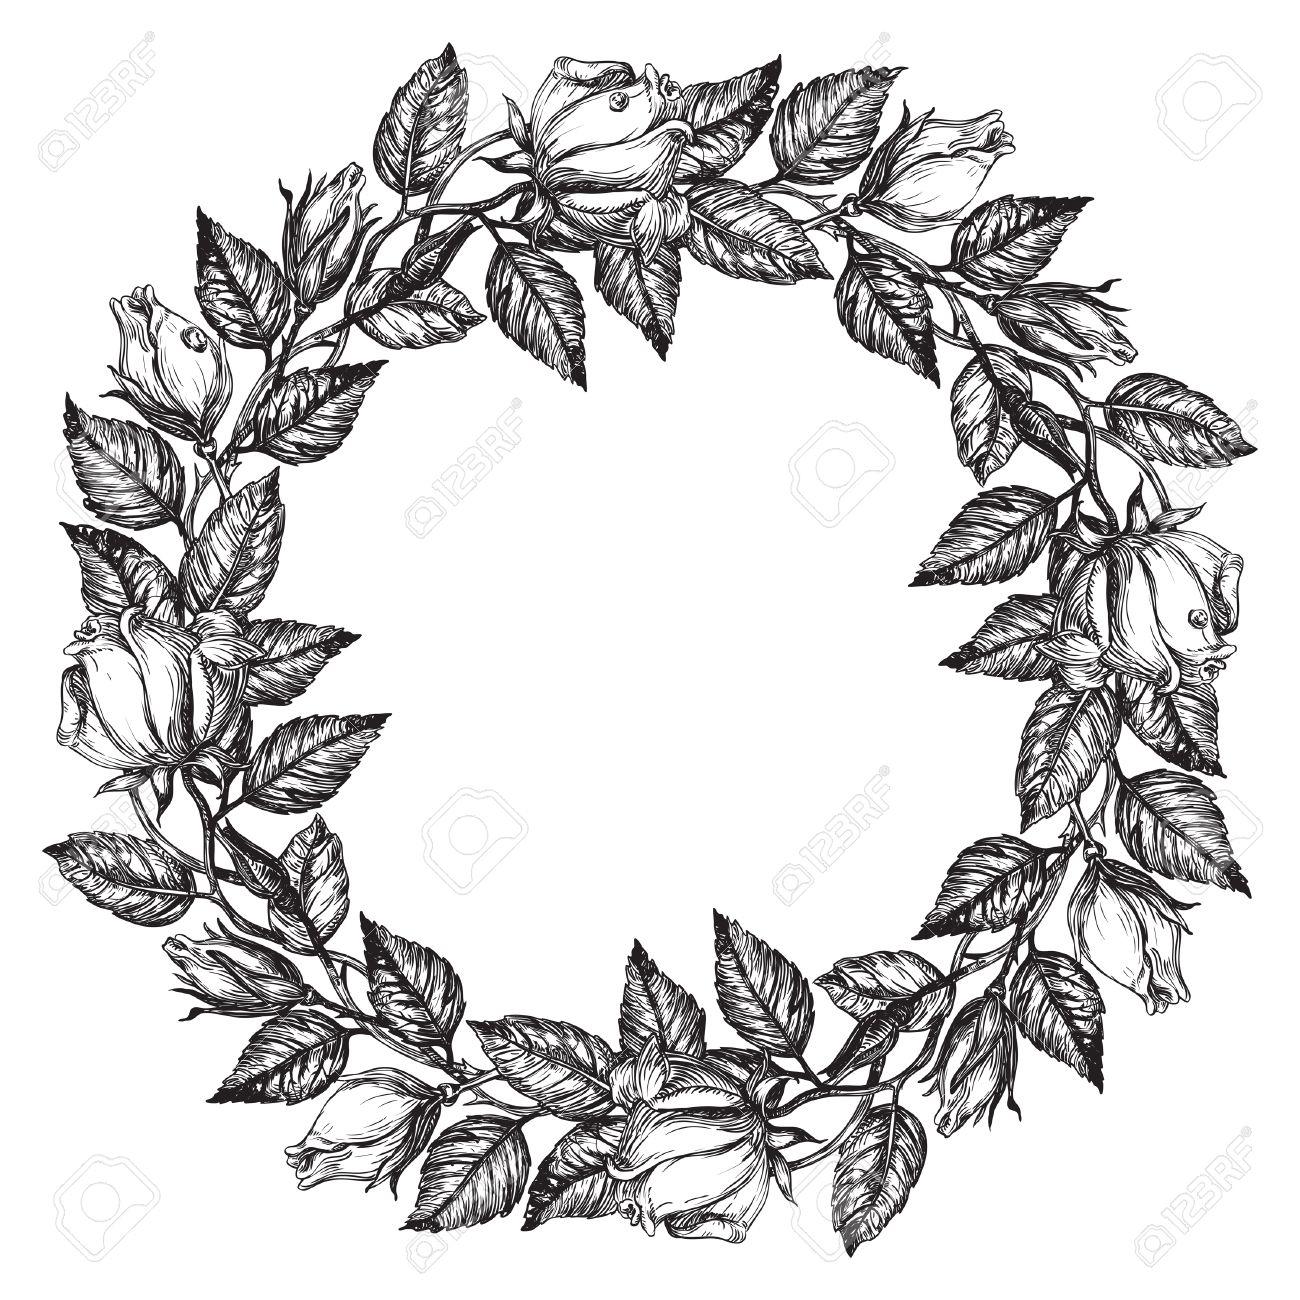 1300x1300 Flowers Drawings With Border Knumathise Rose Clip Art Black